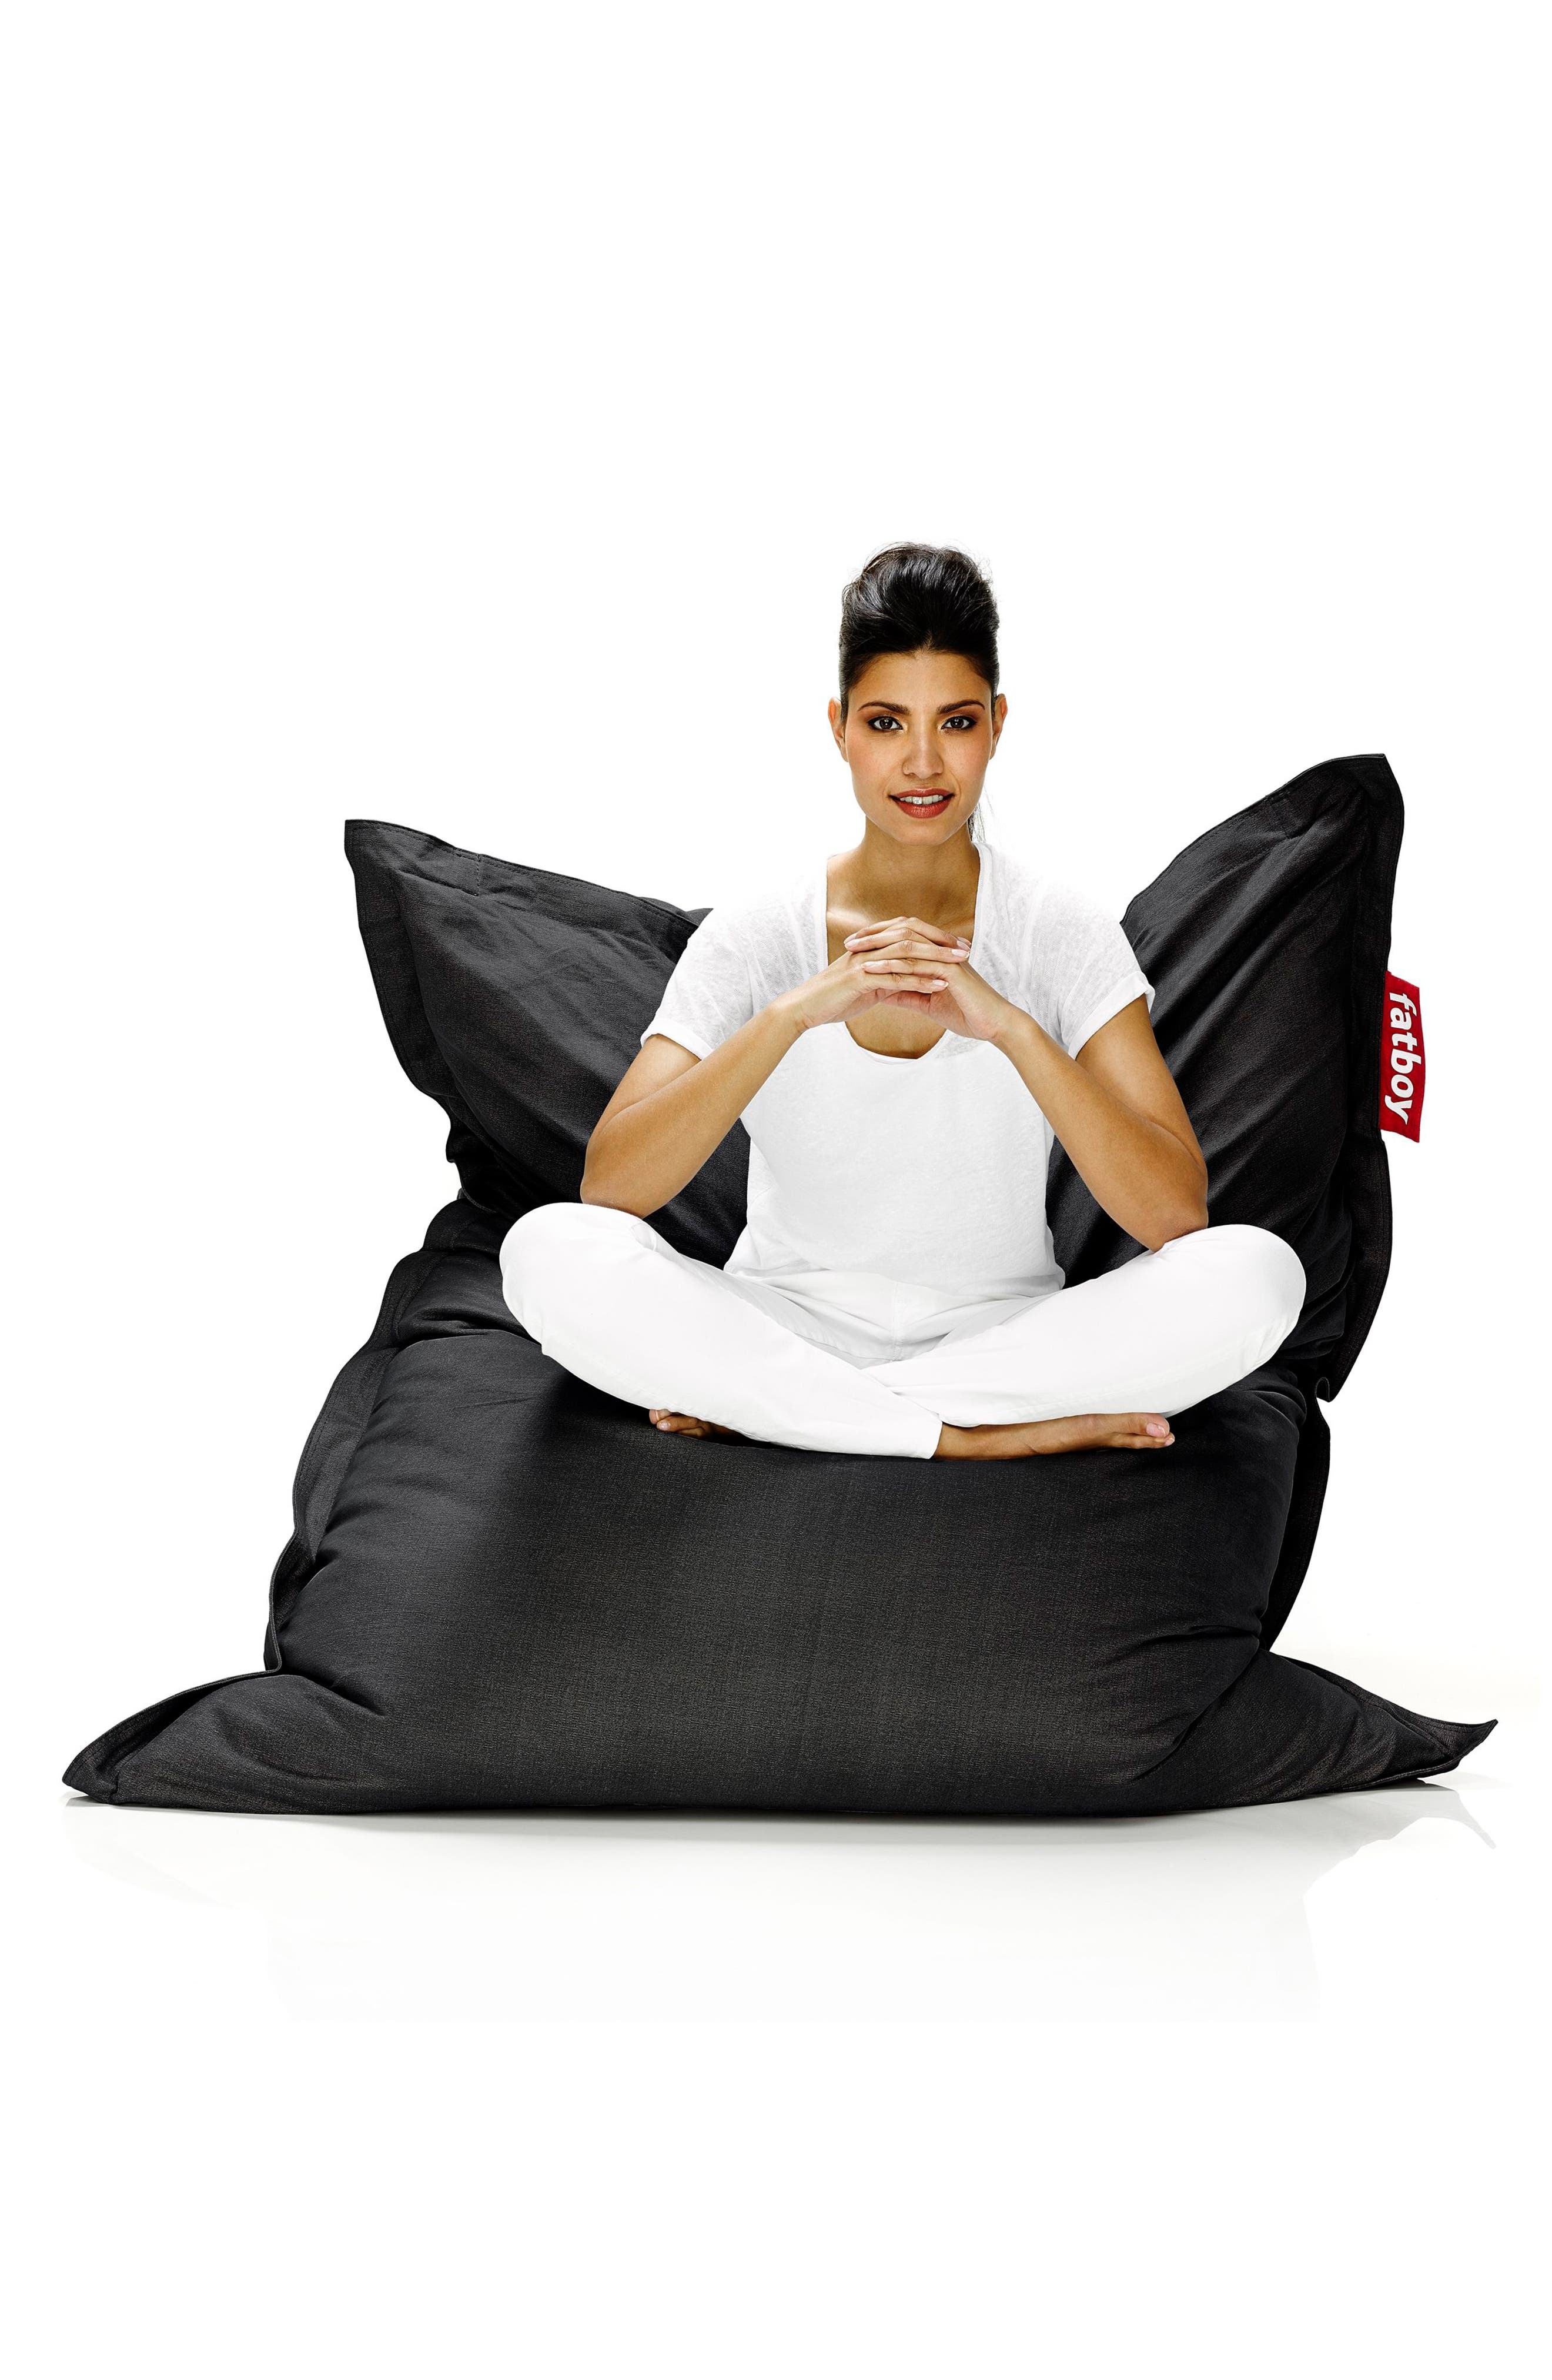 fatboy original bag by wayfair name default furniture chair bnd bean brand